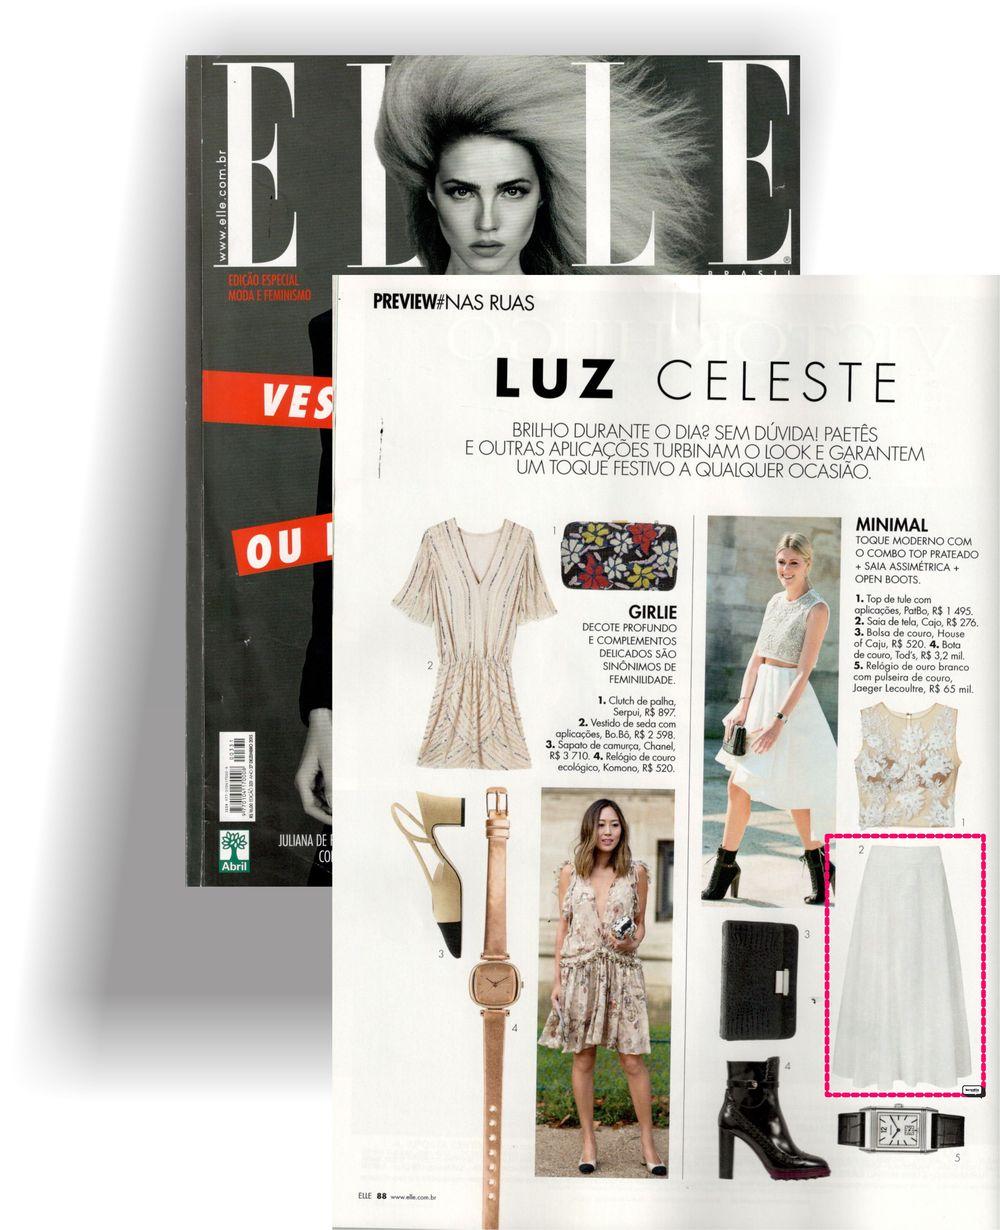 Cajo - Revista Elle - Dezembro de 2015.jpg